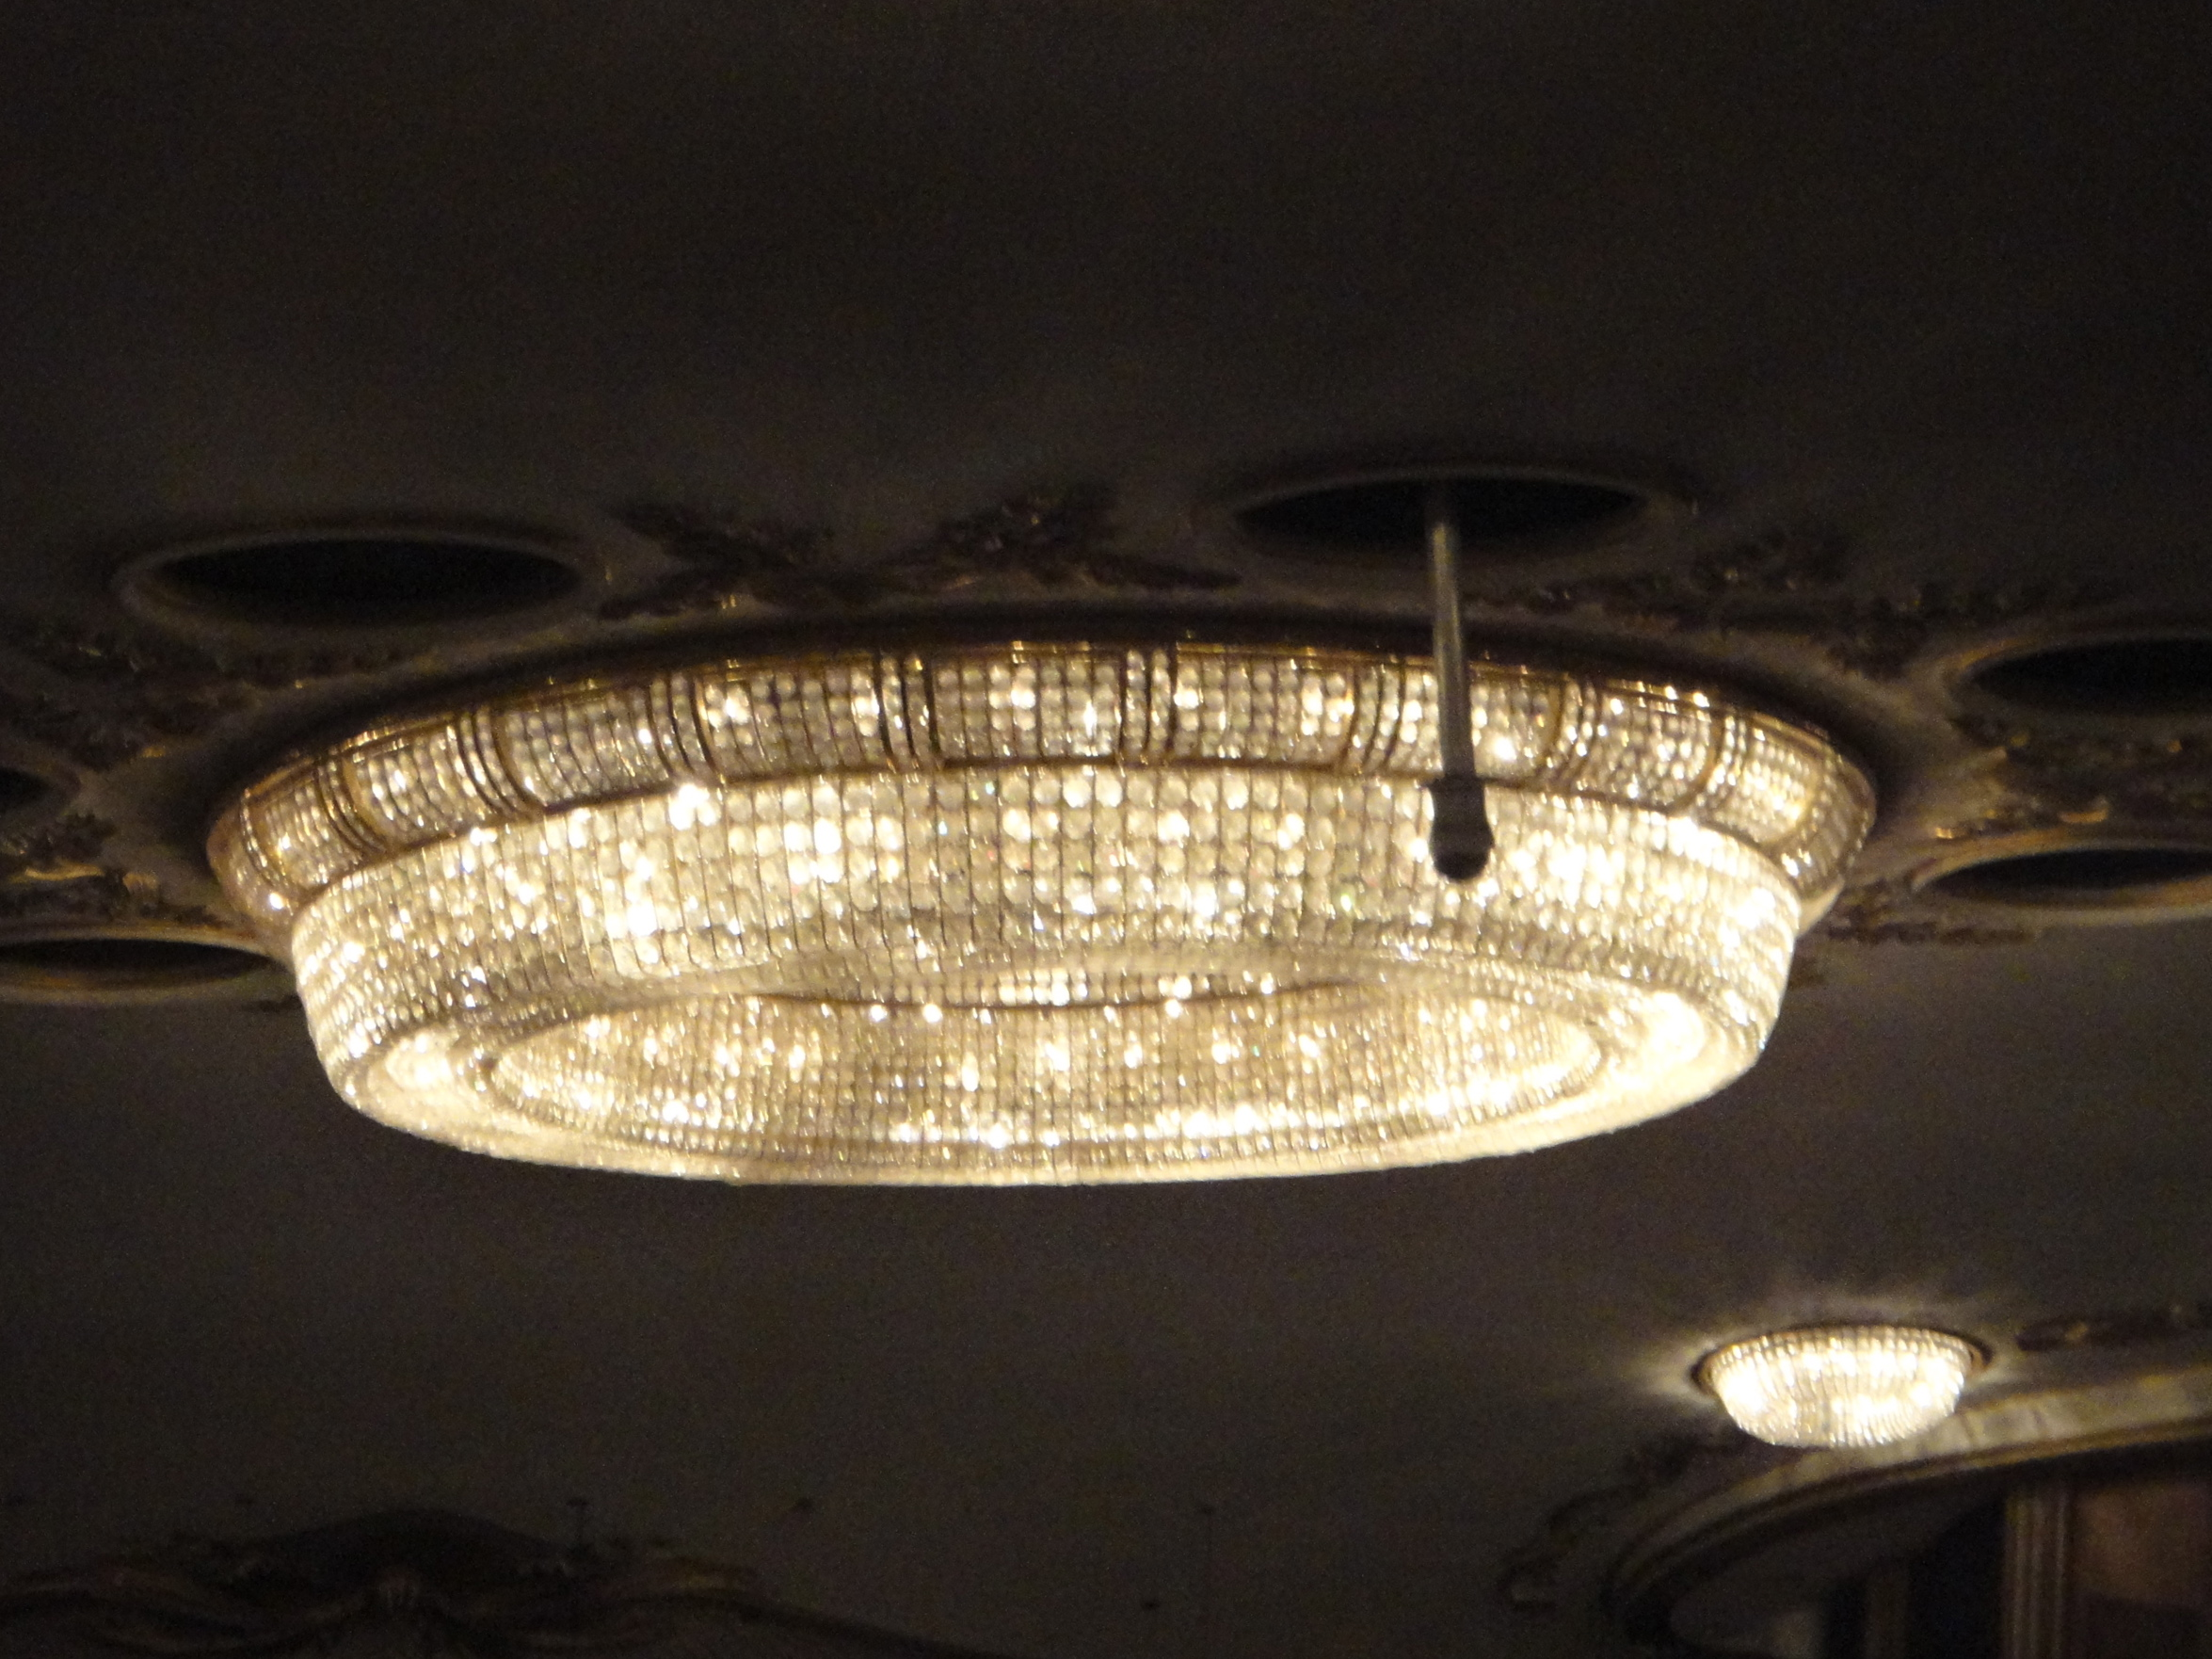 chandelier - Burgtheater - Kronleuchter